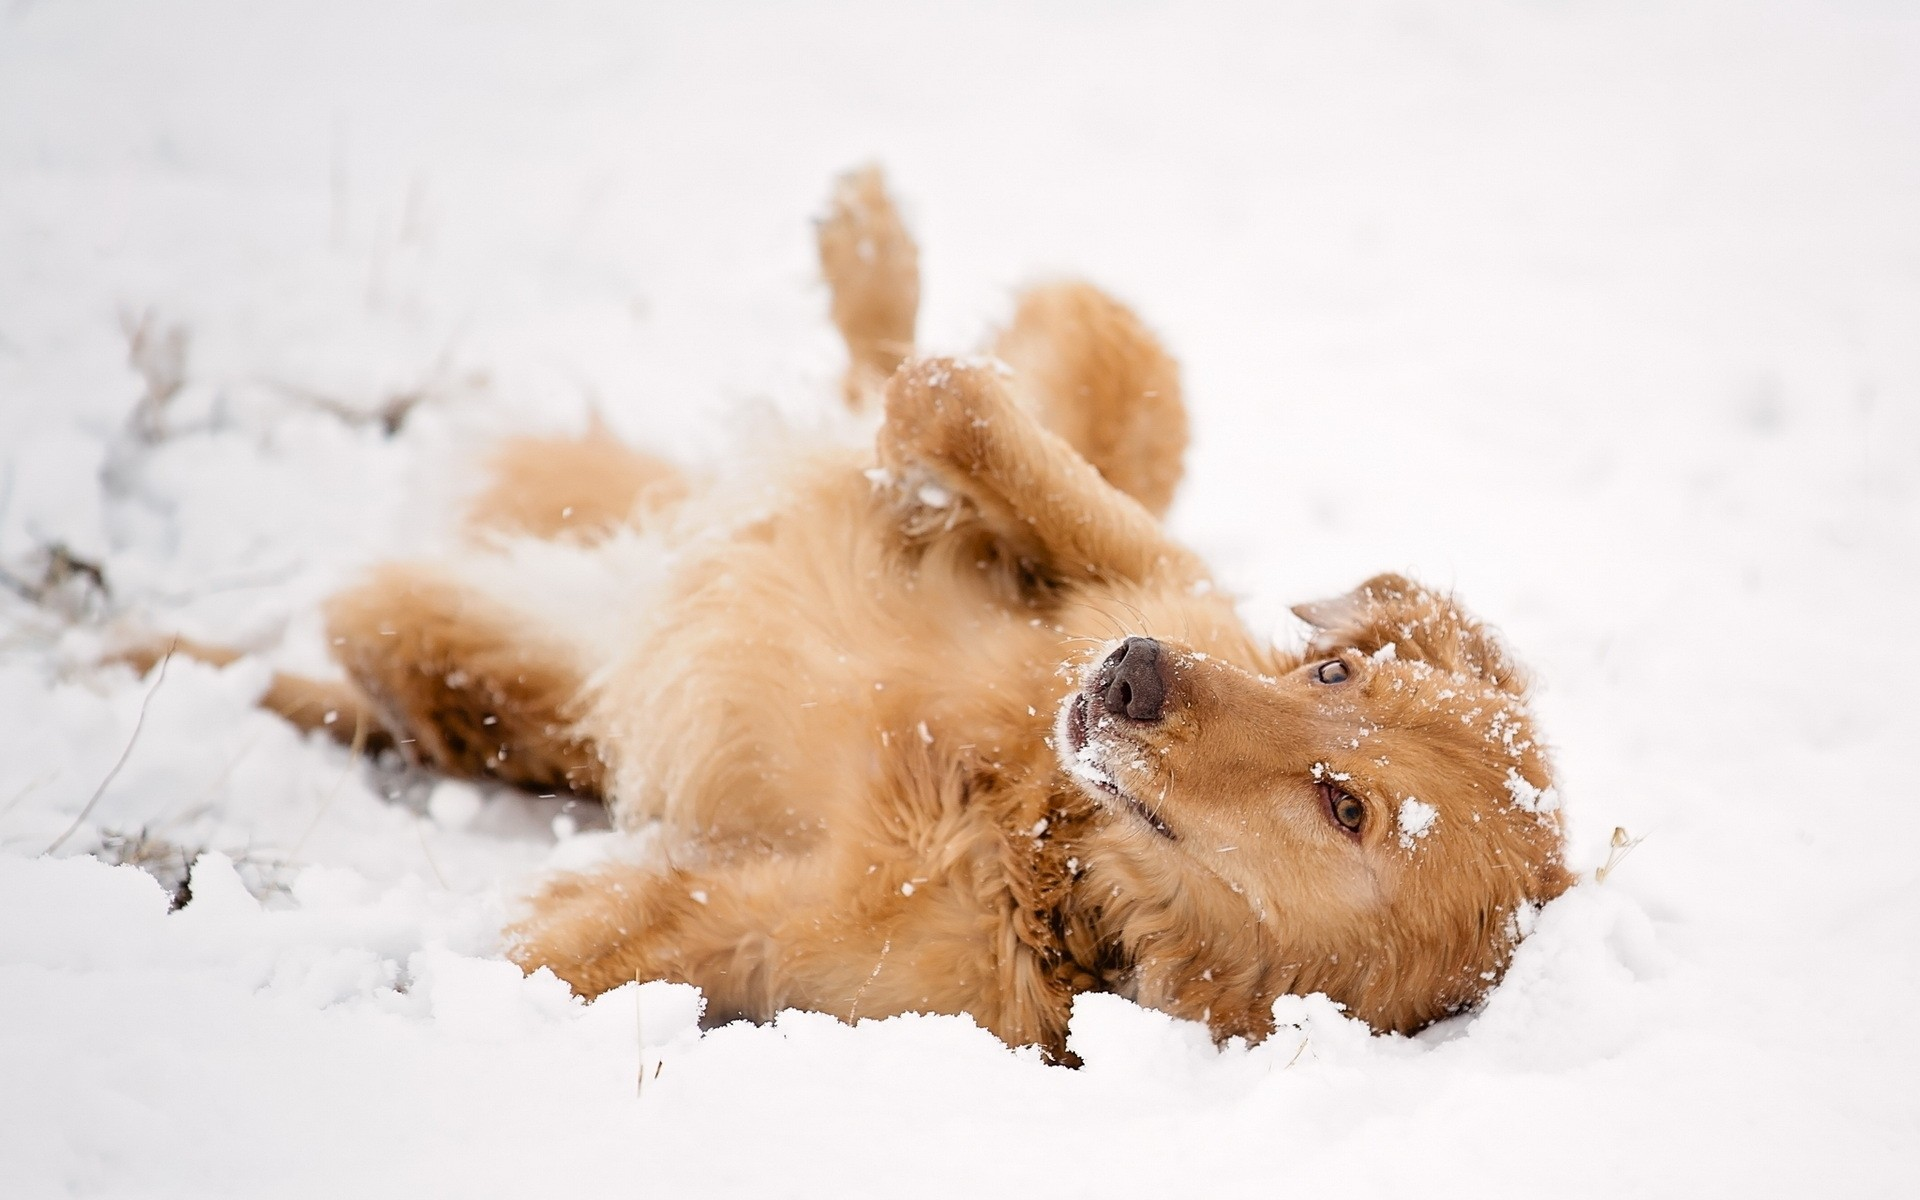 собака снег морда одиночество без смс